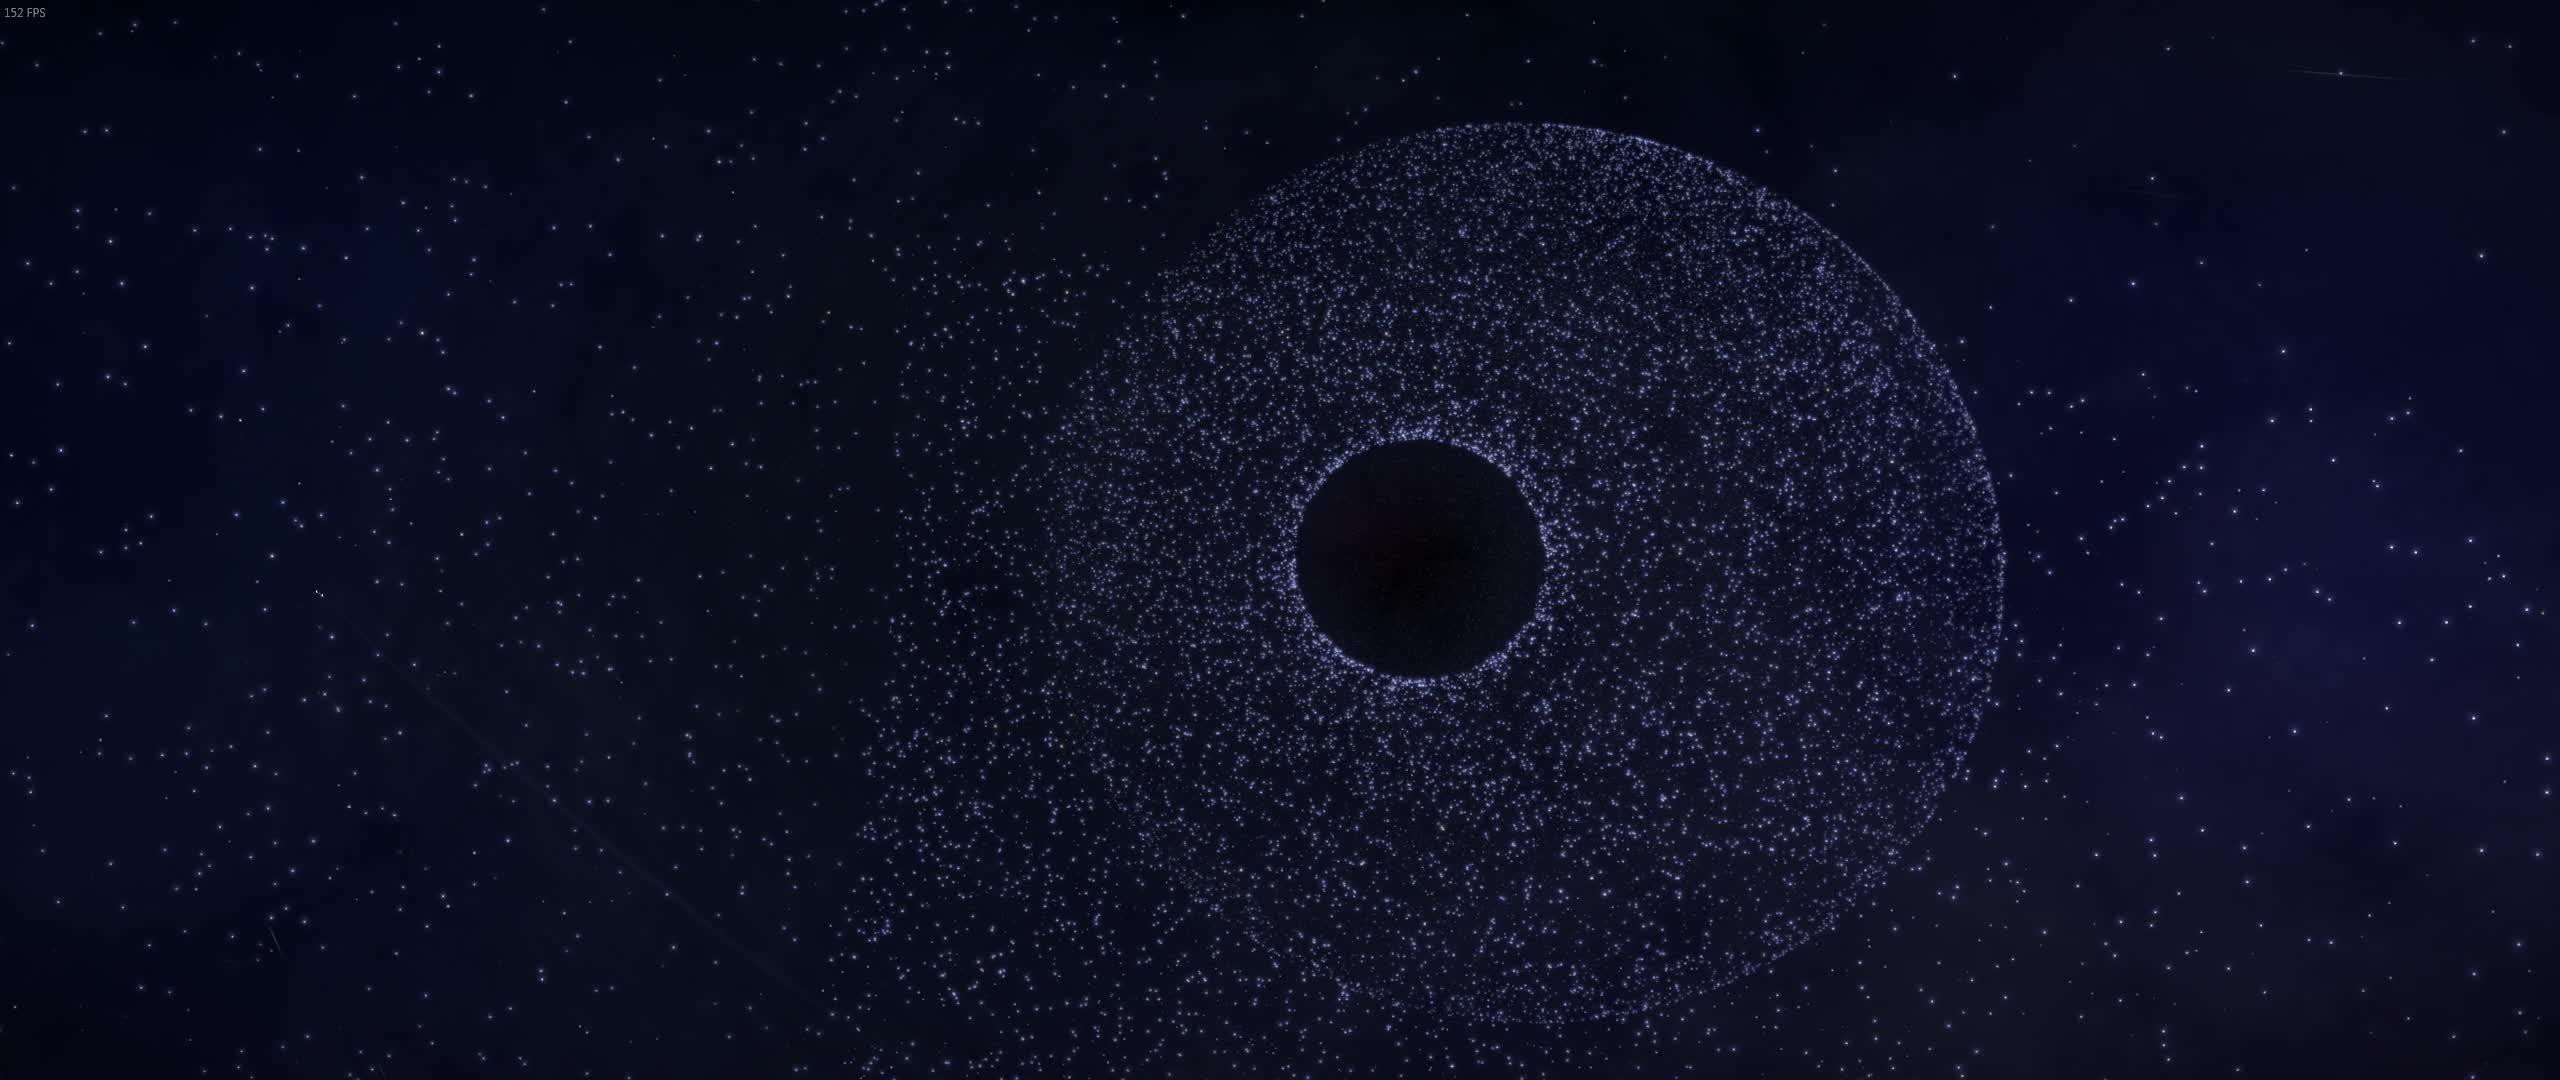 elitedangerous, Elite Dangerous 2018.11.29 - 17.51.07.01 GIFs